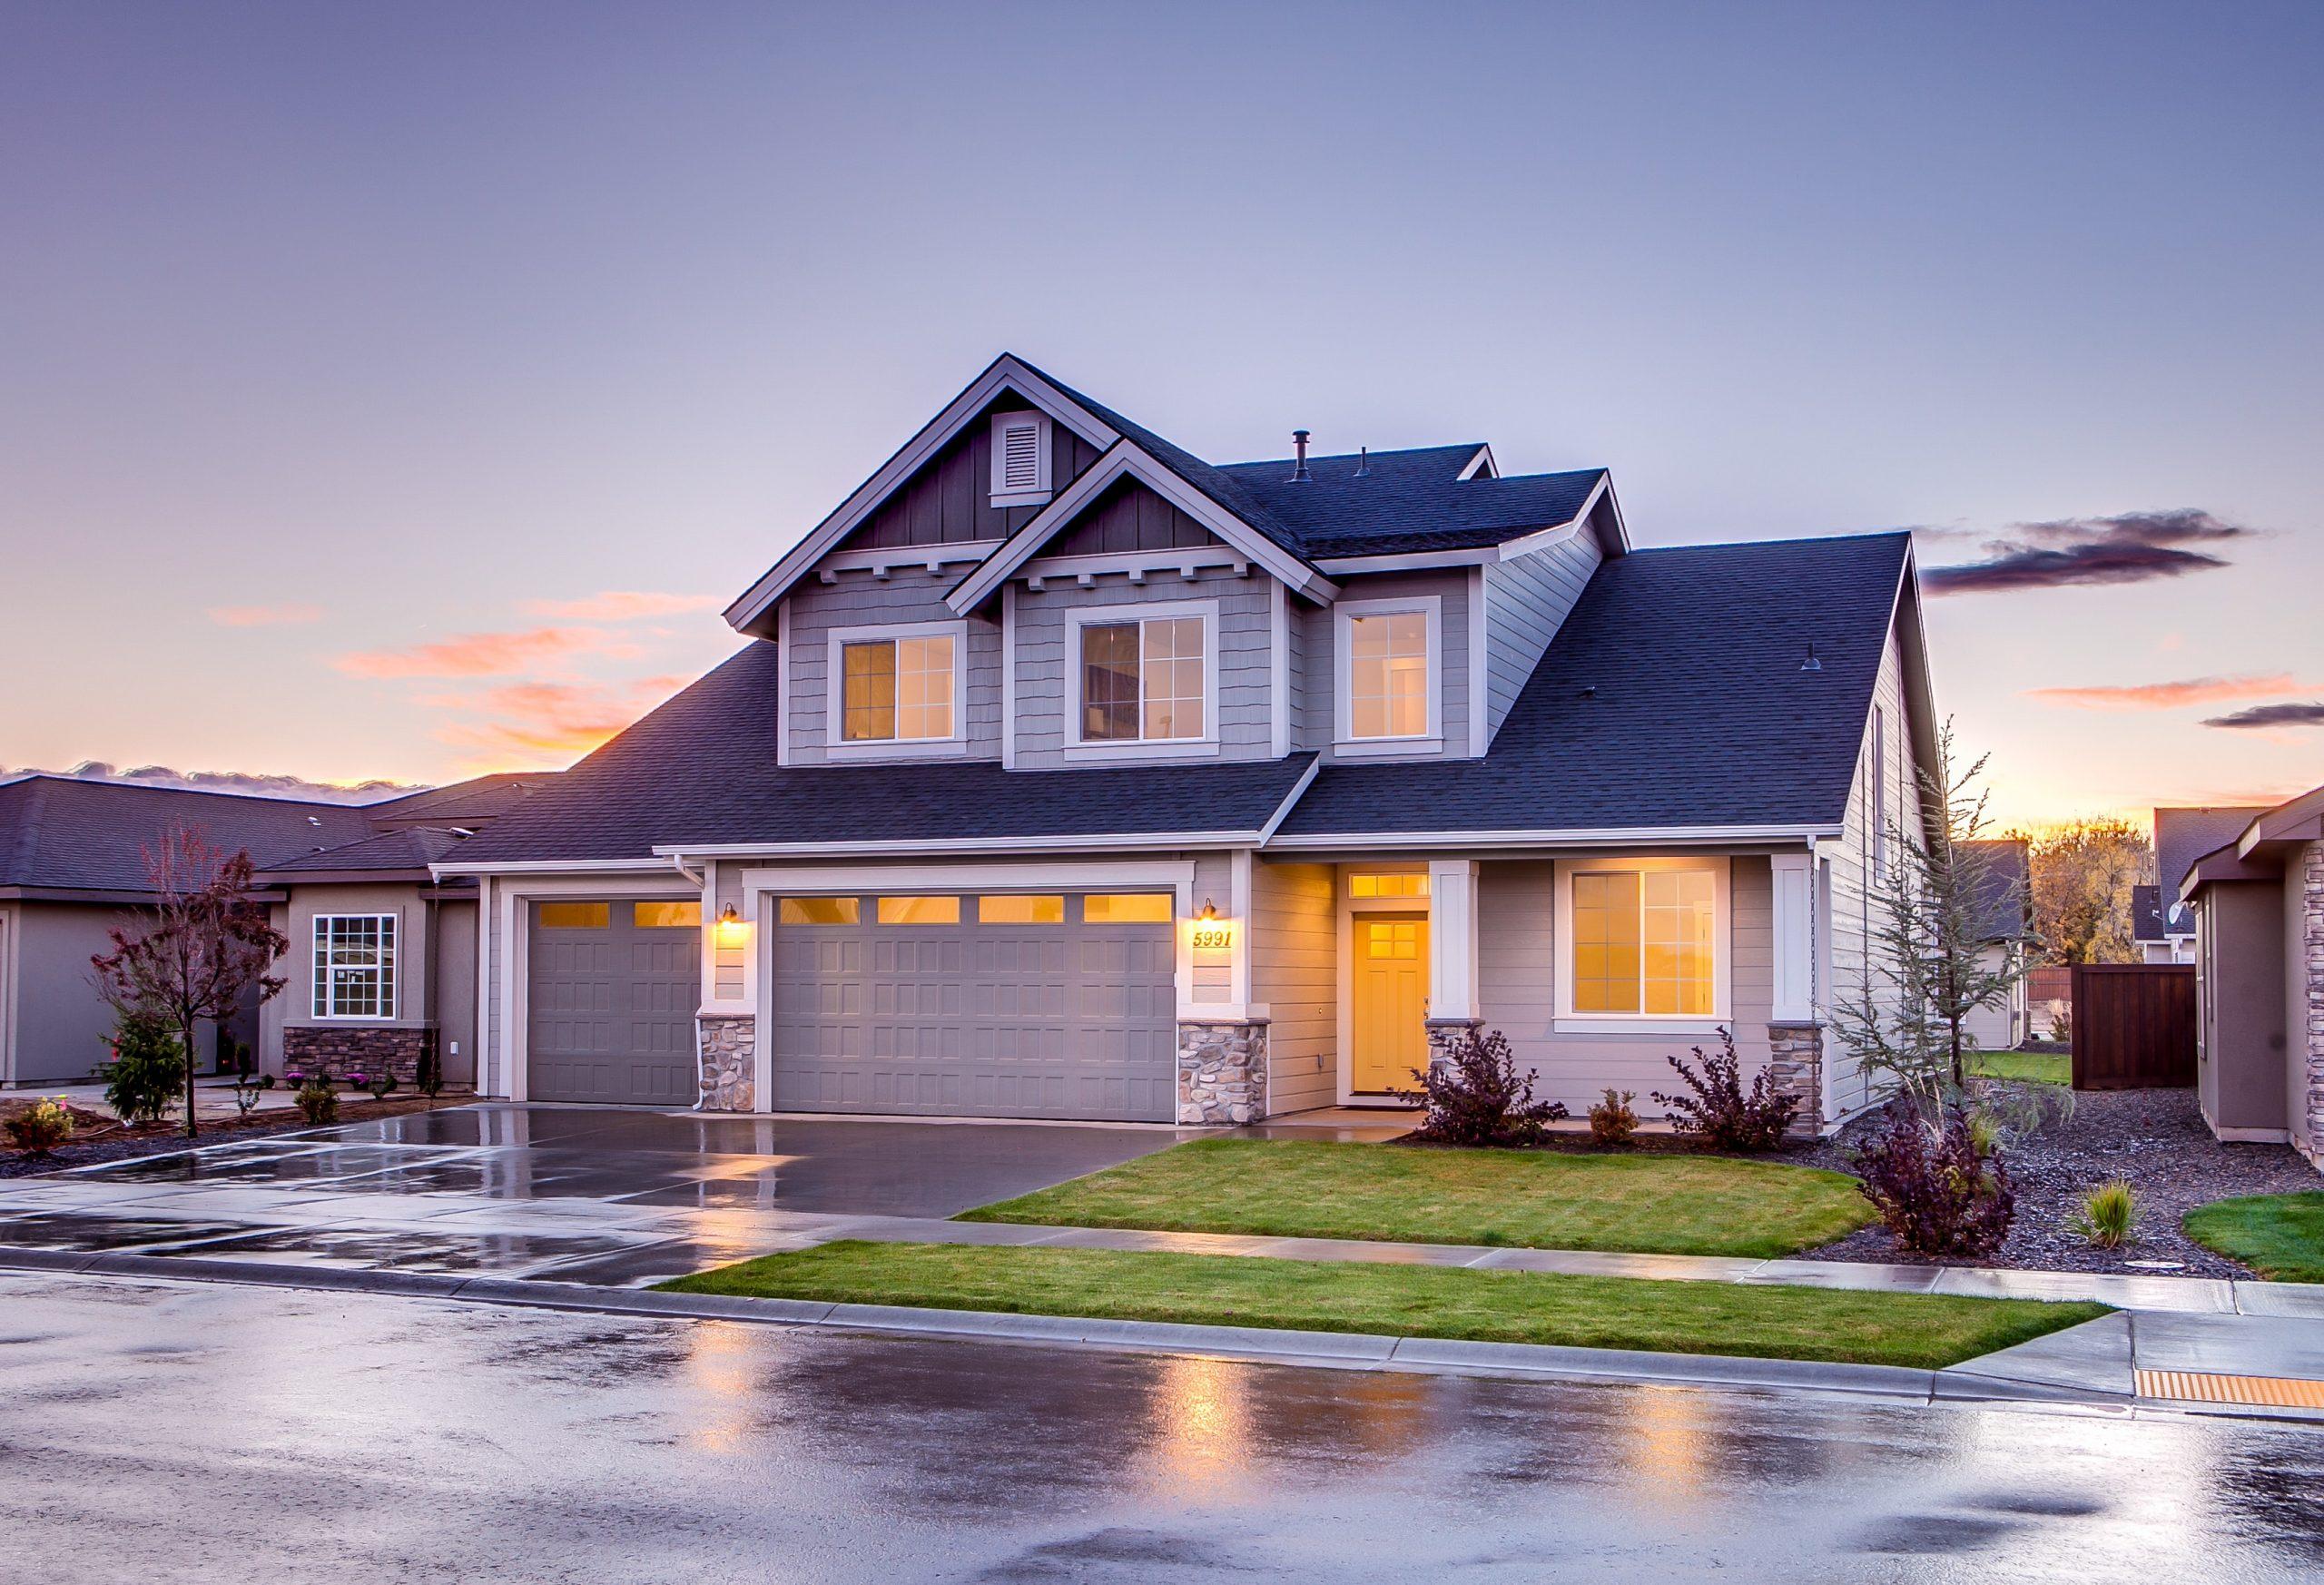 American Liberty Mortgage - Northern Colorado & Wyoming Home Loans